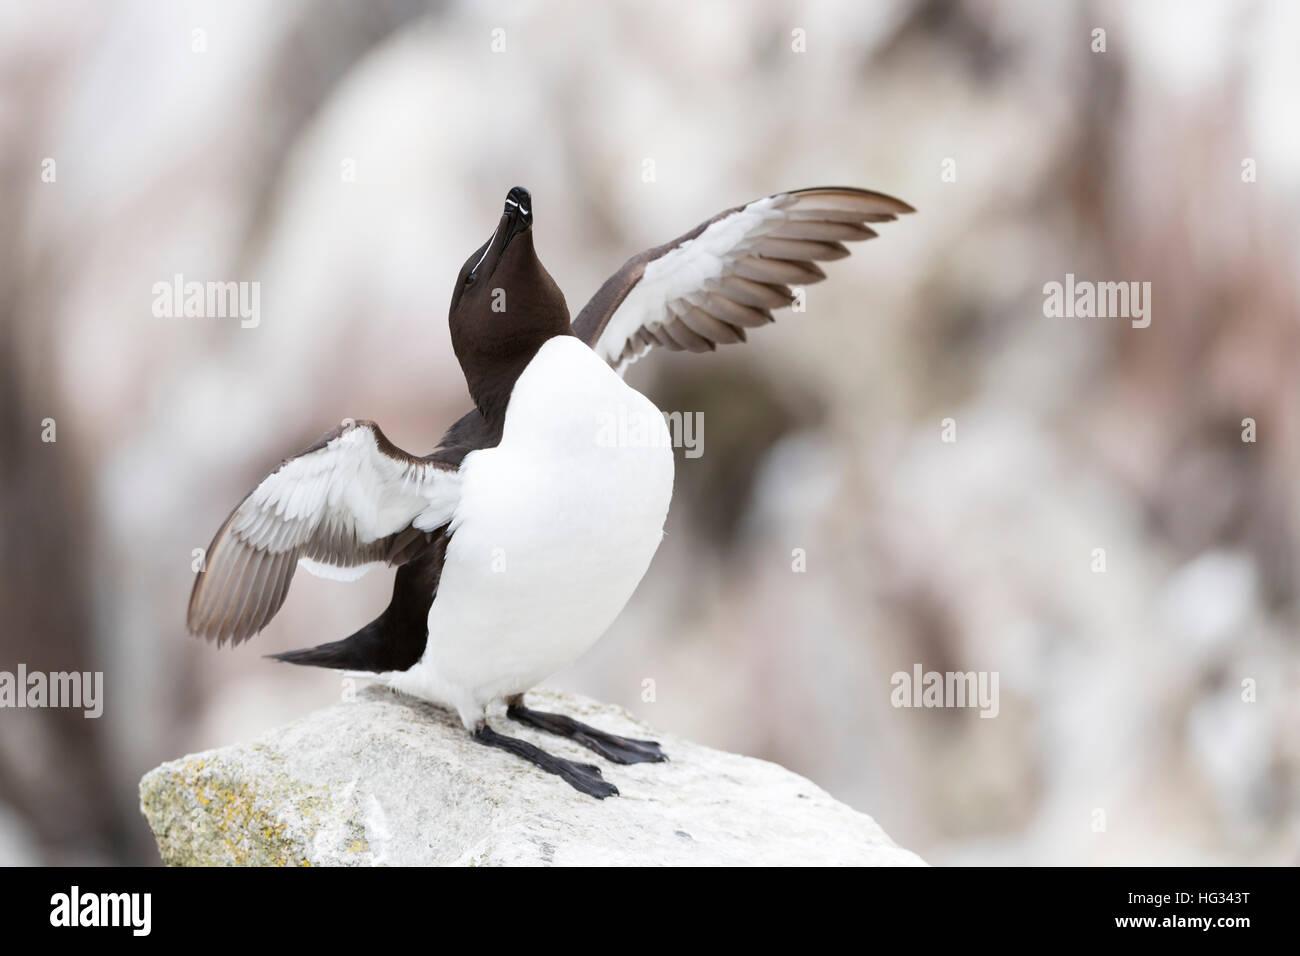 Razorbill (Alca torda) adult, standing on rock of coastal cliff, flapping wings, Great Saltee, Saltee Island, Ireland. - Stock Image